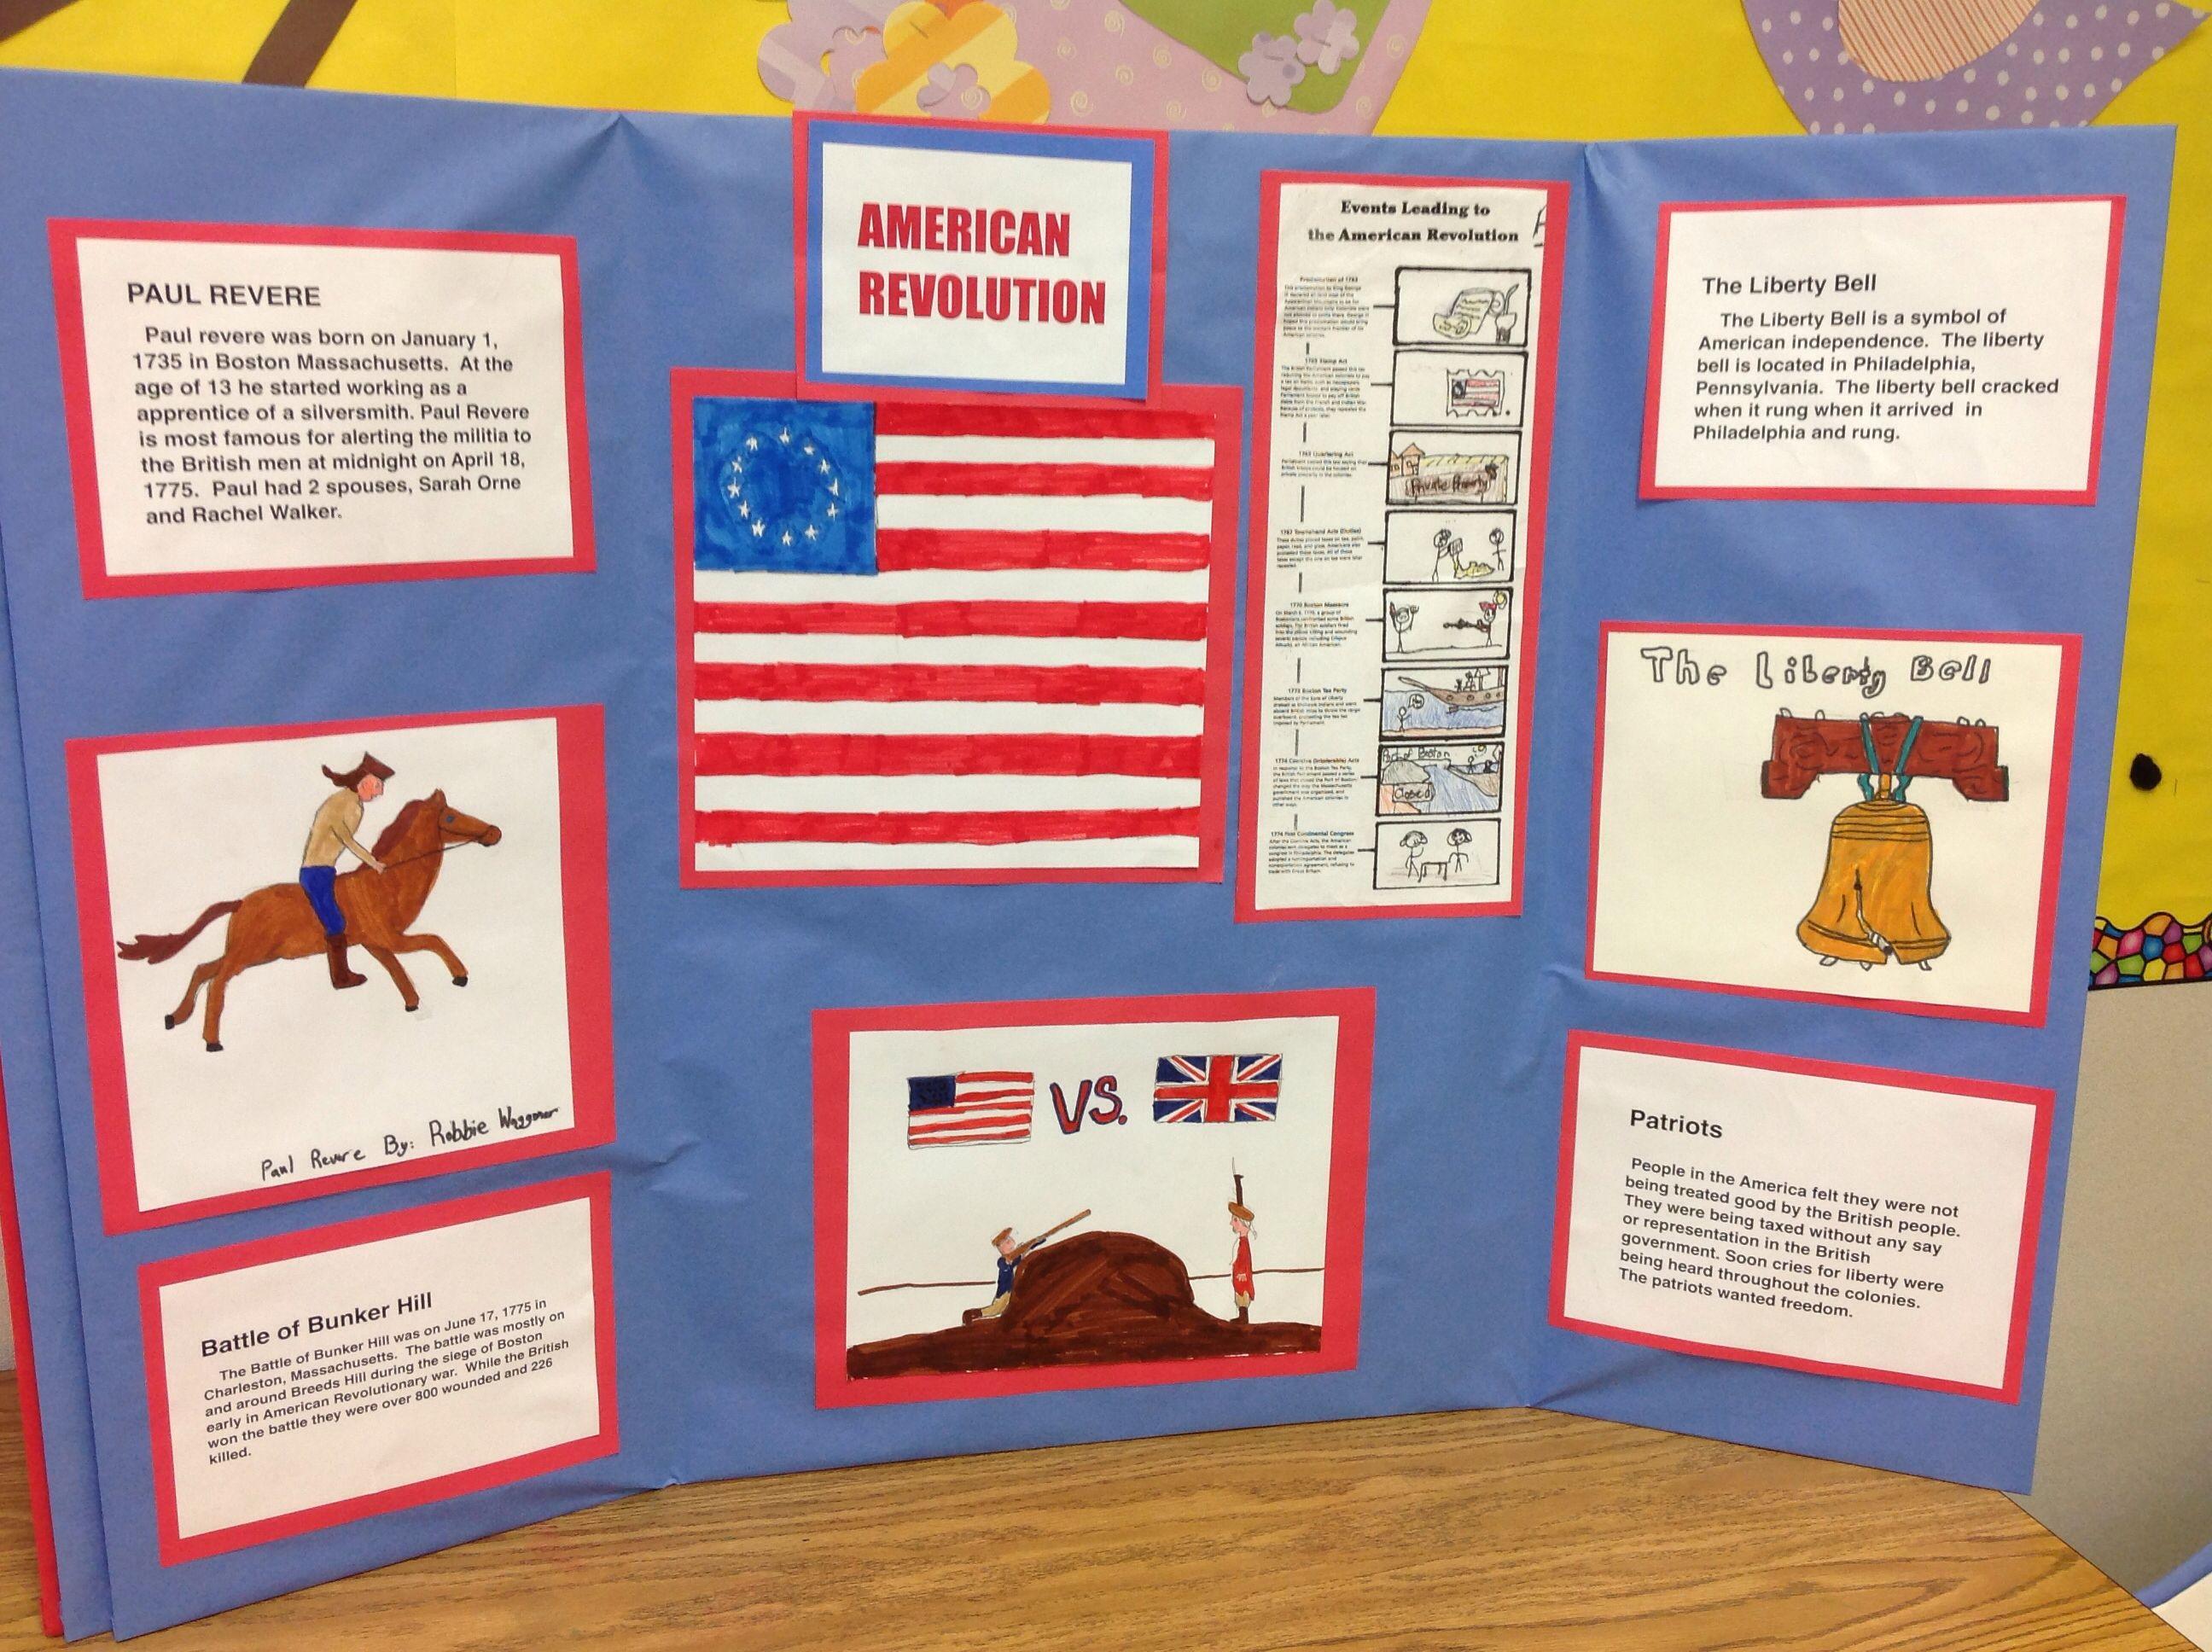 American Revolution Poster 5th Grade